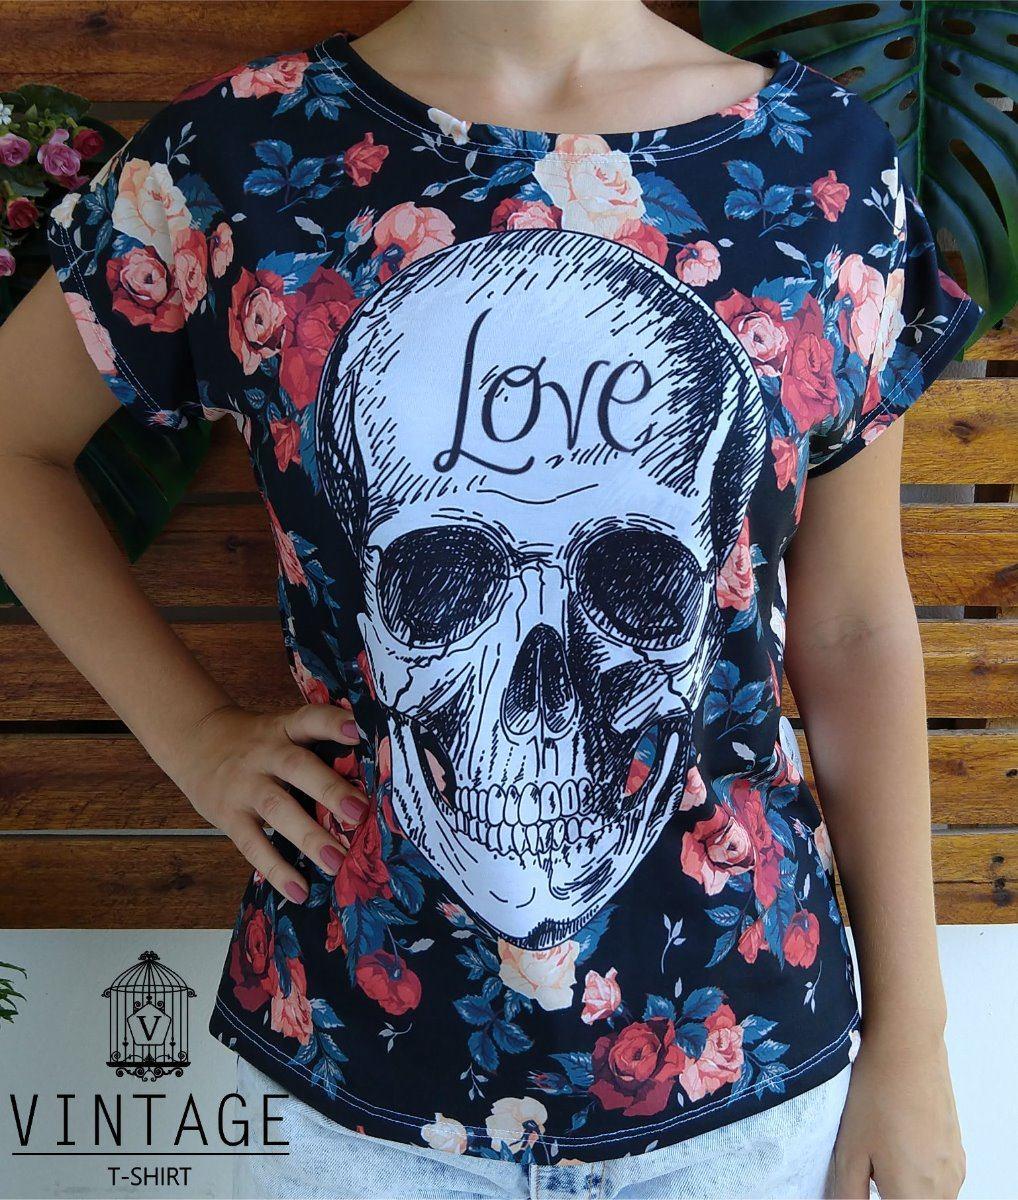 ... Blusa Tshirt Camiseta Feminina Caveira Floral Love Tamanho M R 69 2b3a53551f9